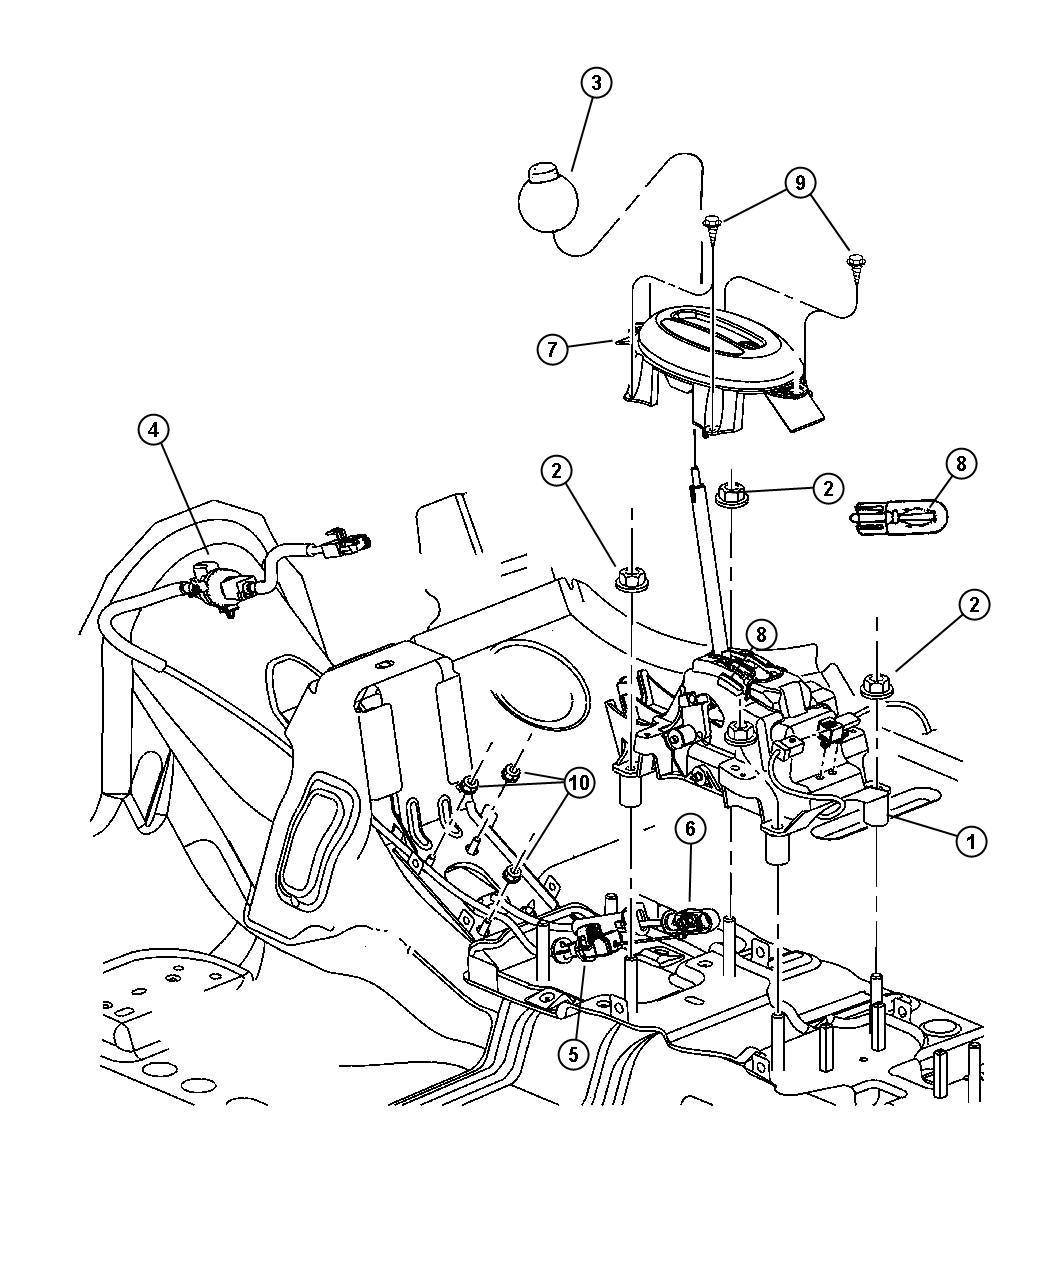 1994 oldsmobile bravada wiring diagram also showassembly further vw bus transaxle diagram html also 1971 volkswagen